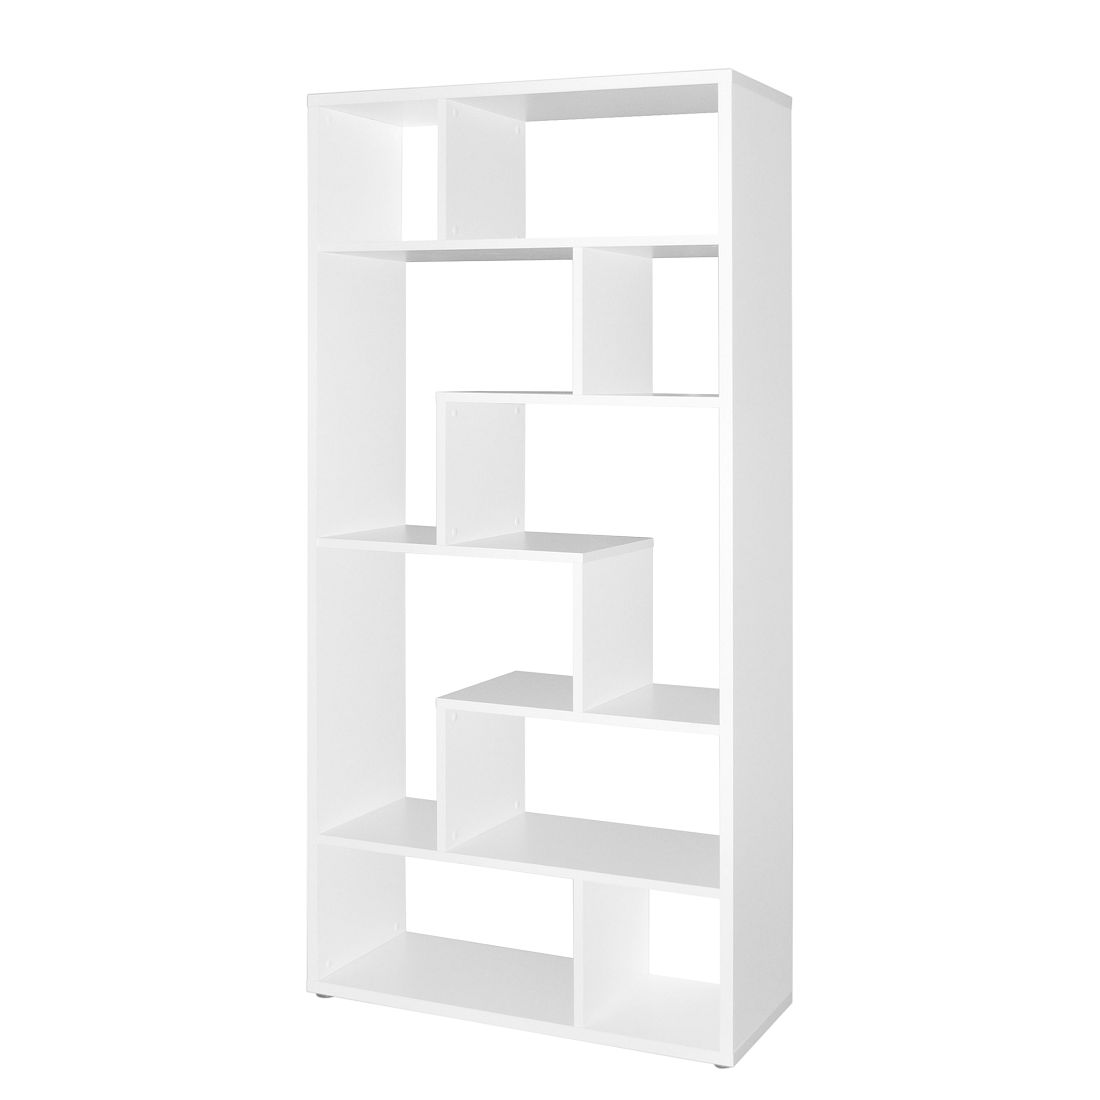 raumteiler 90 cm breit bestseller shop f r m bel und. Black Bedroom Furniture Sets. Home Design Ideas